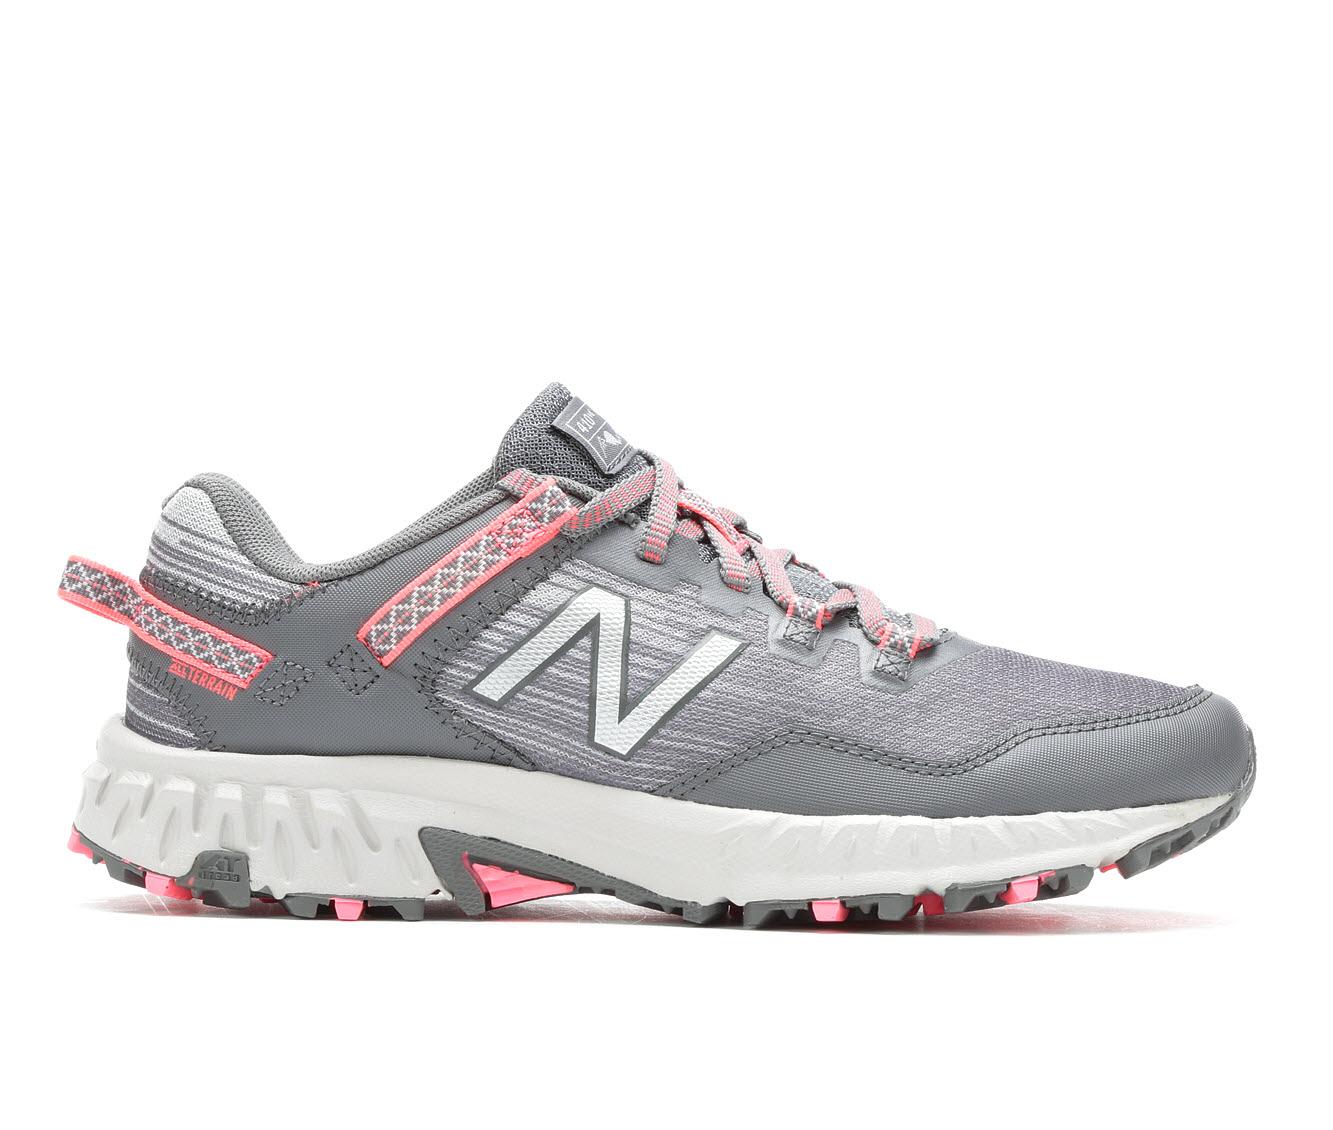 New Balance WT410V6 Women's Athletic Shoe (Gray)